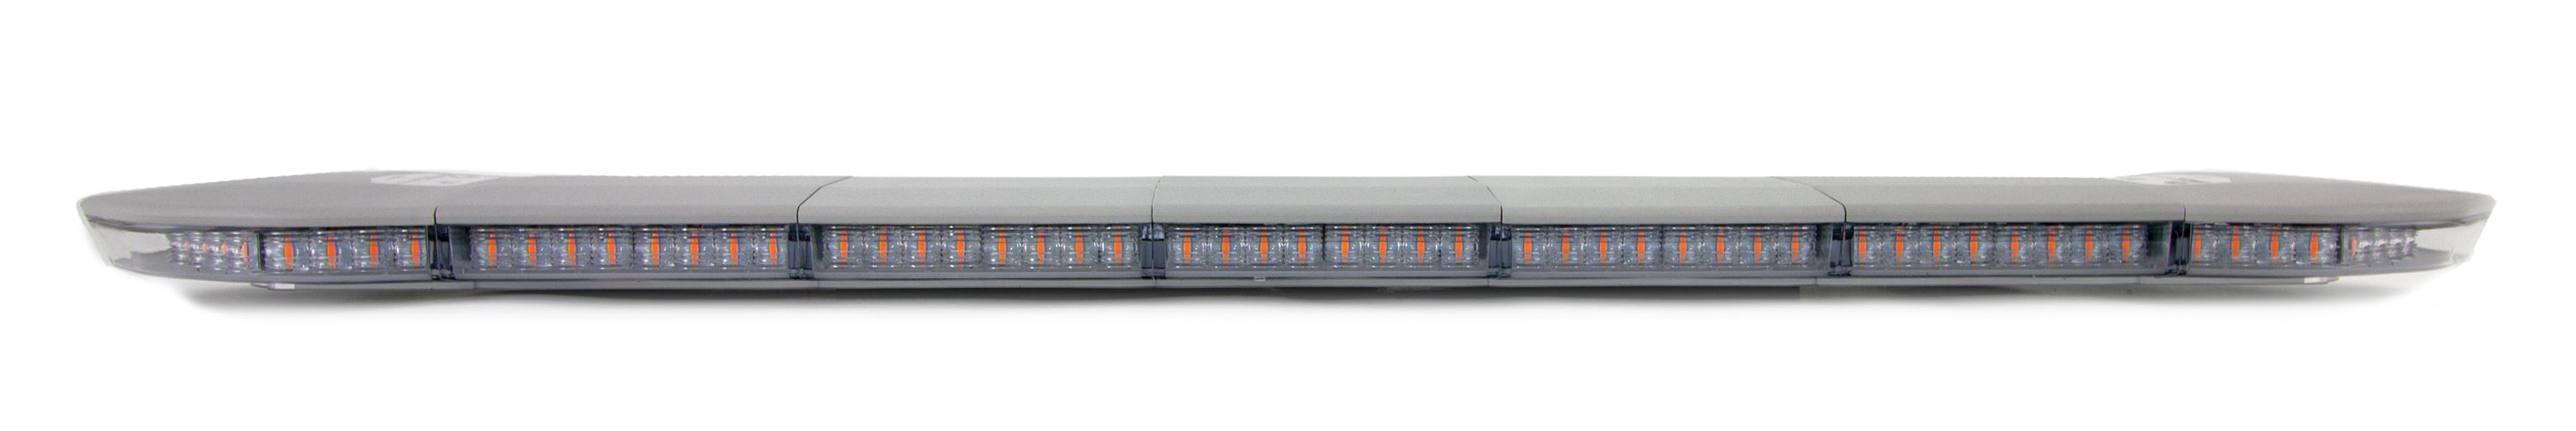 2X Series Lightbar Product Image